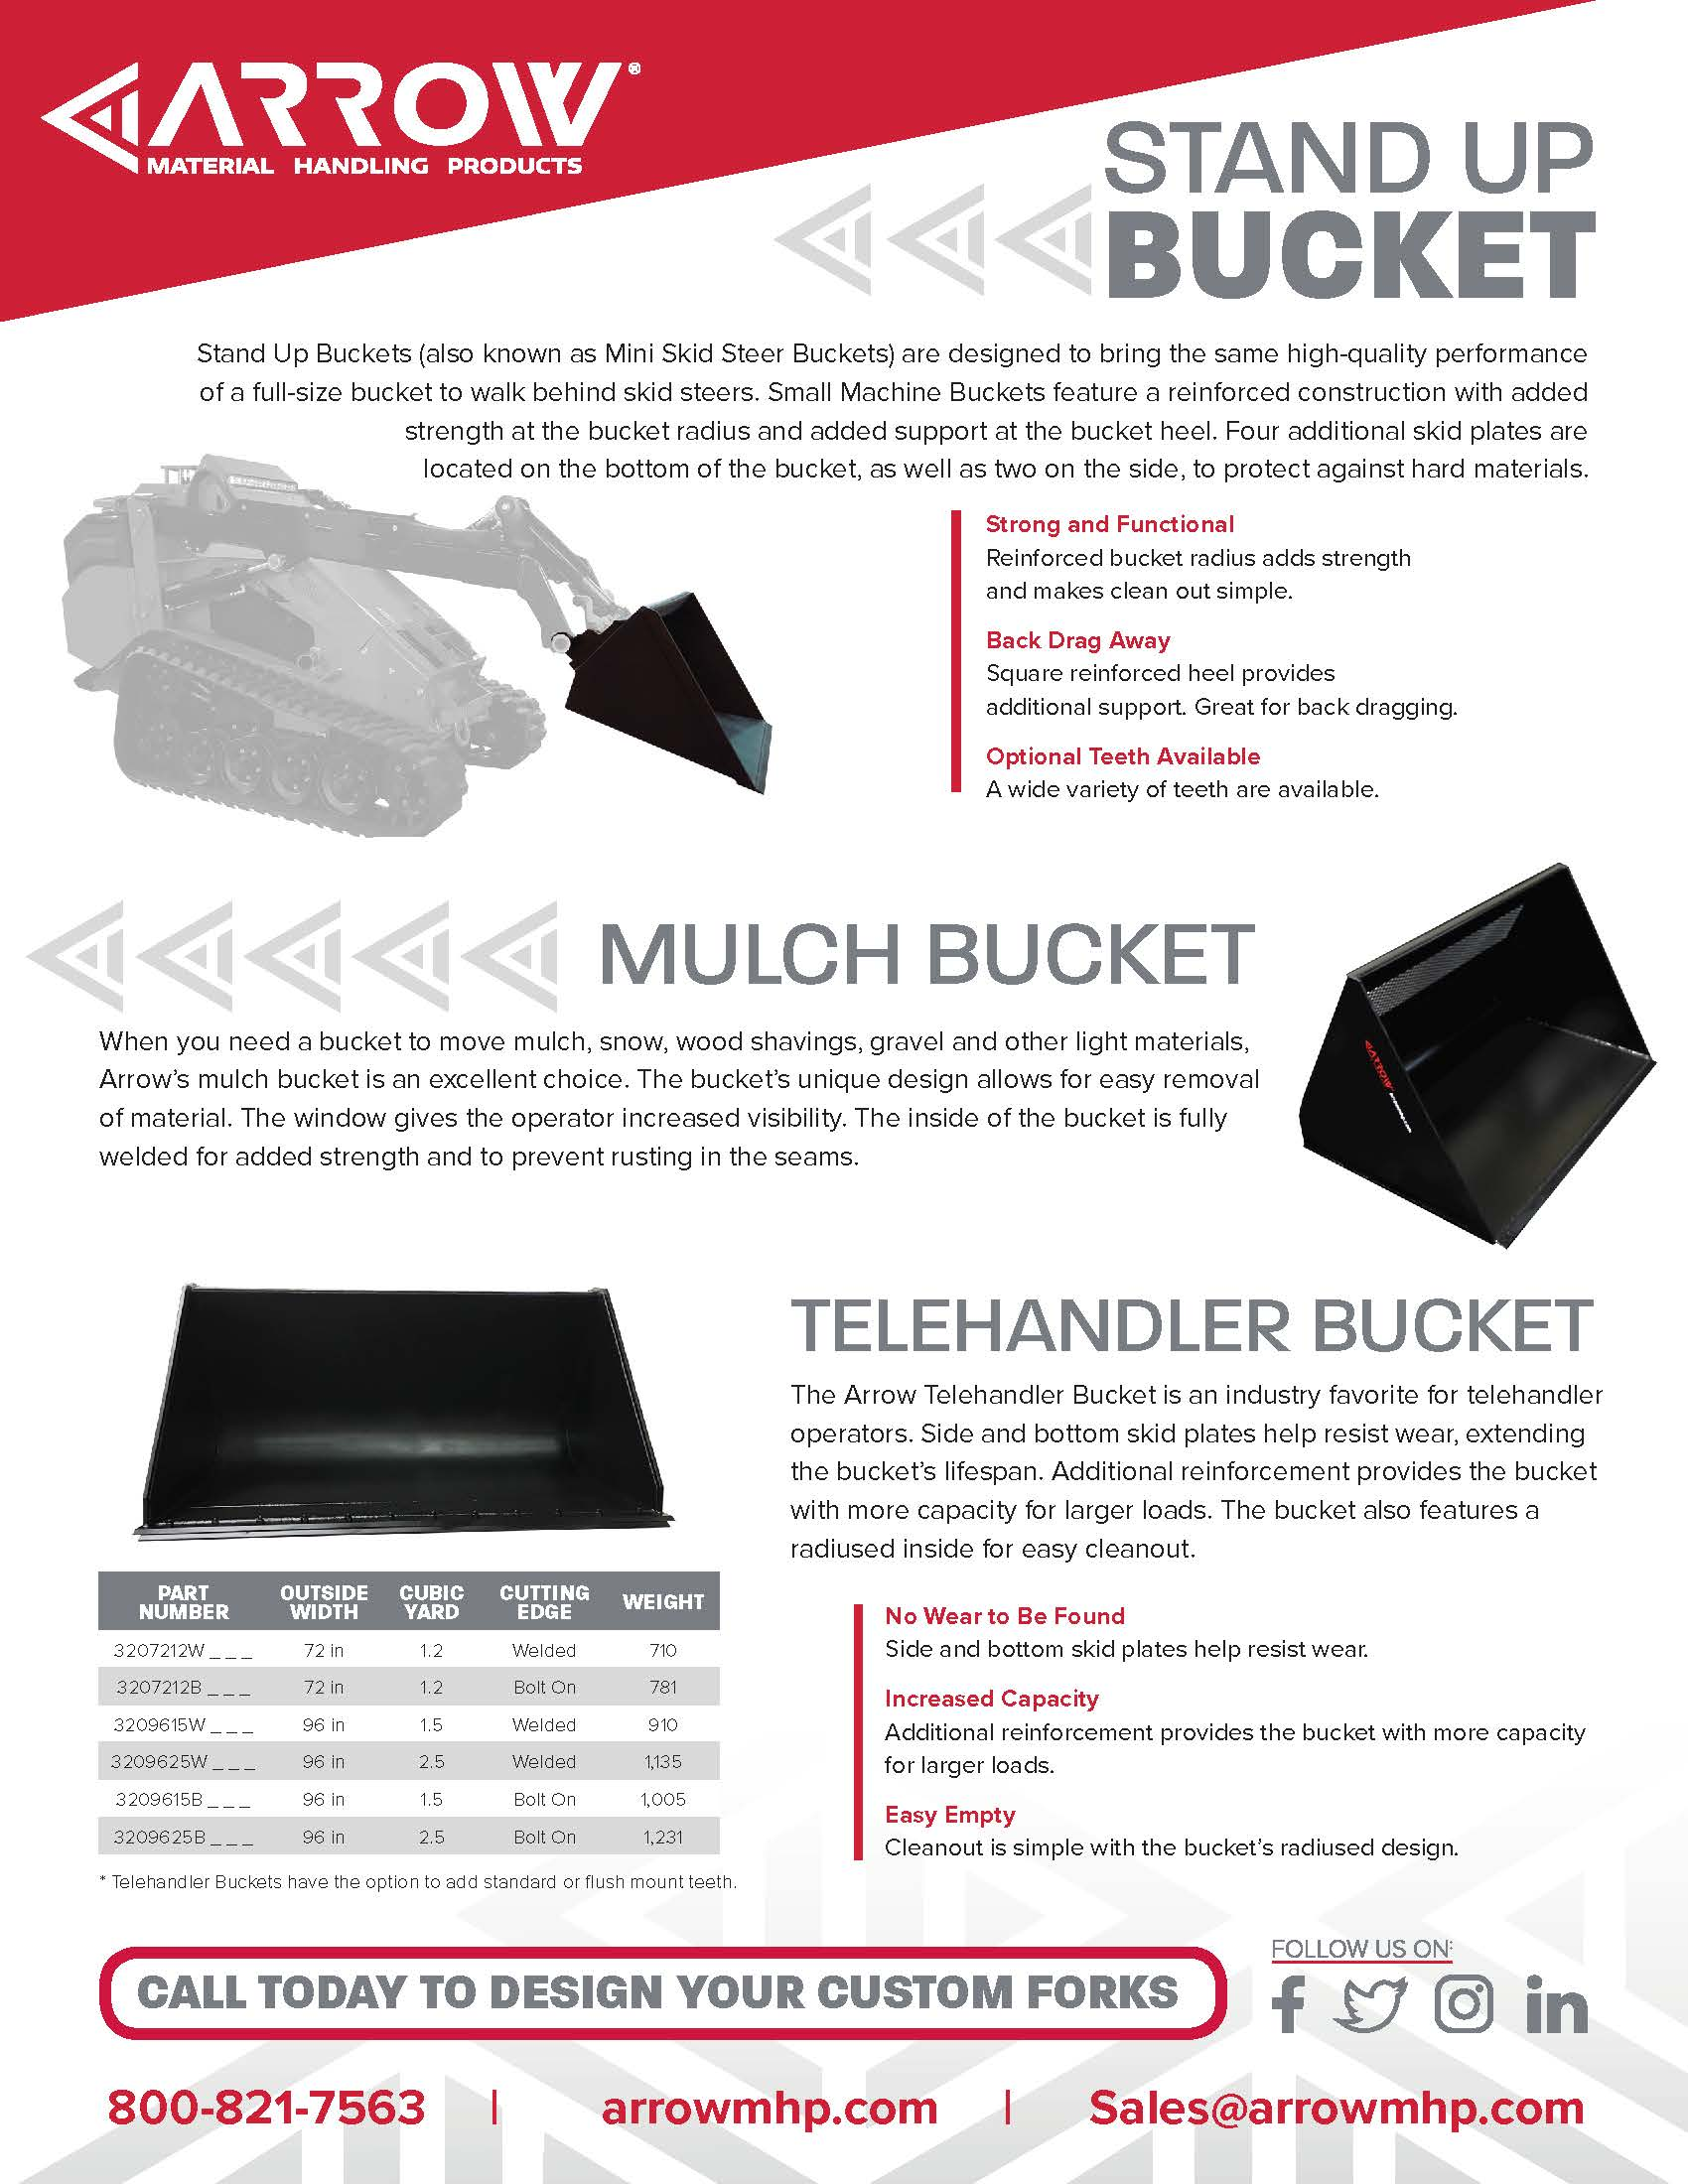 Telehandler Buckets